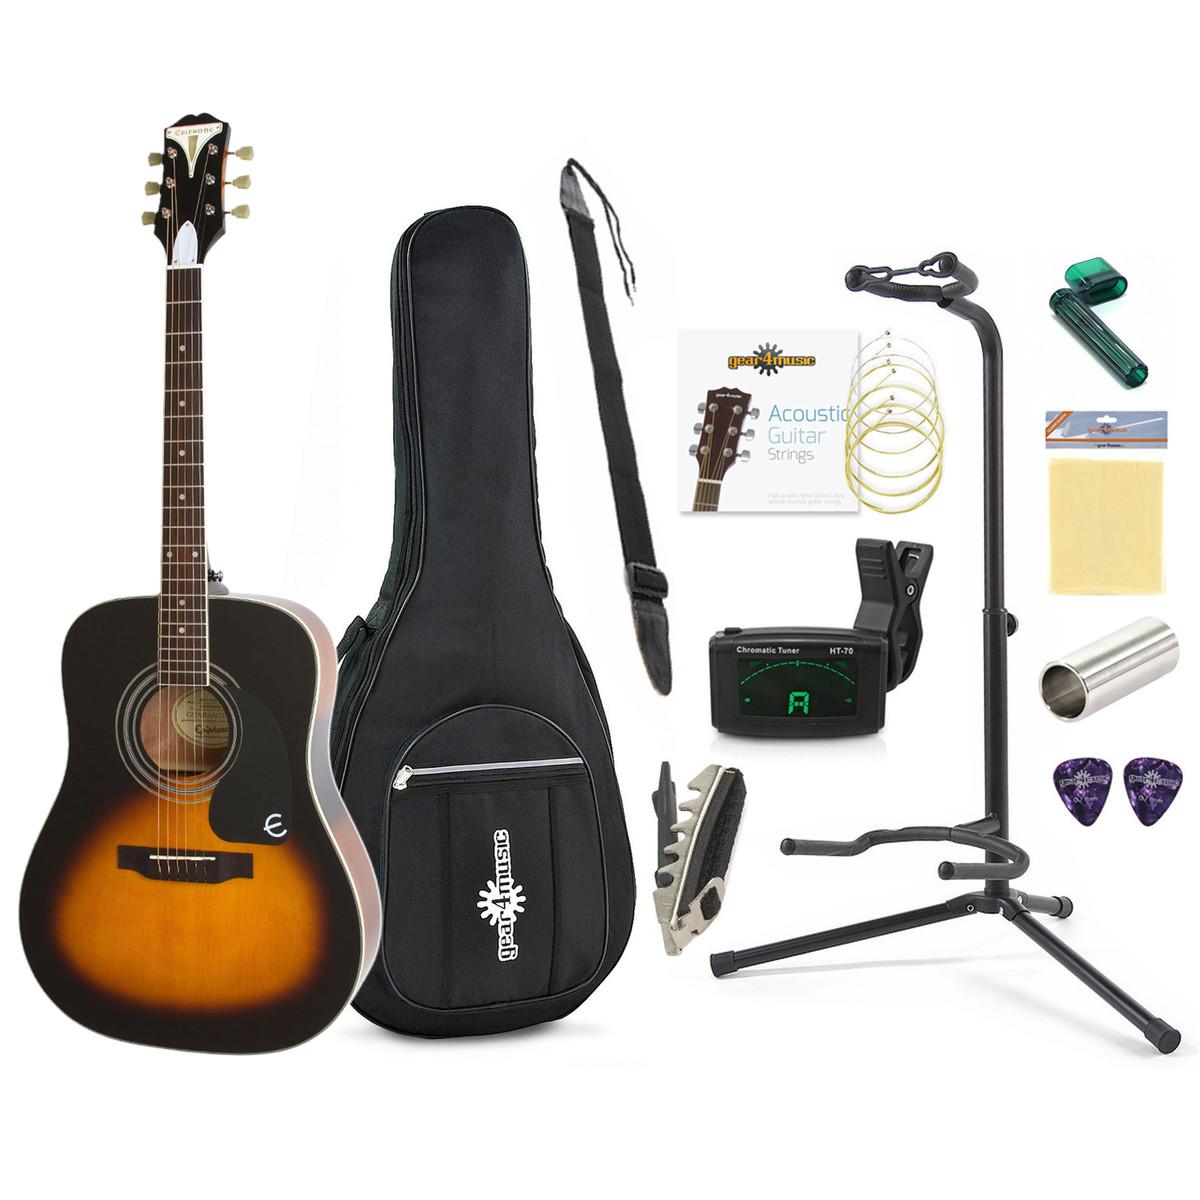 Disc Epiphone Pro 1 Beginners Guitar Pack Vintage